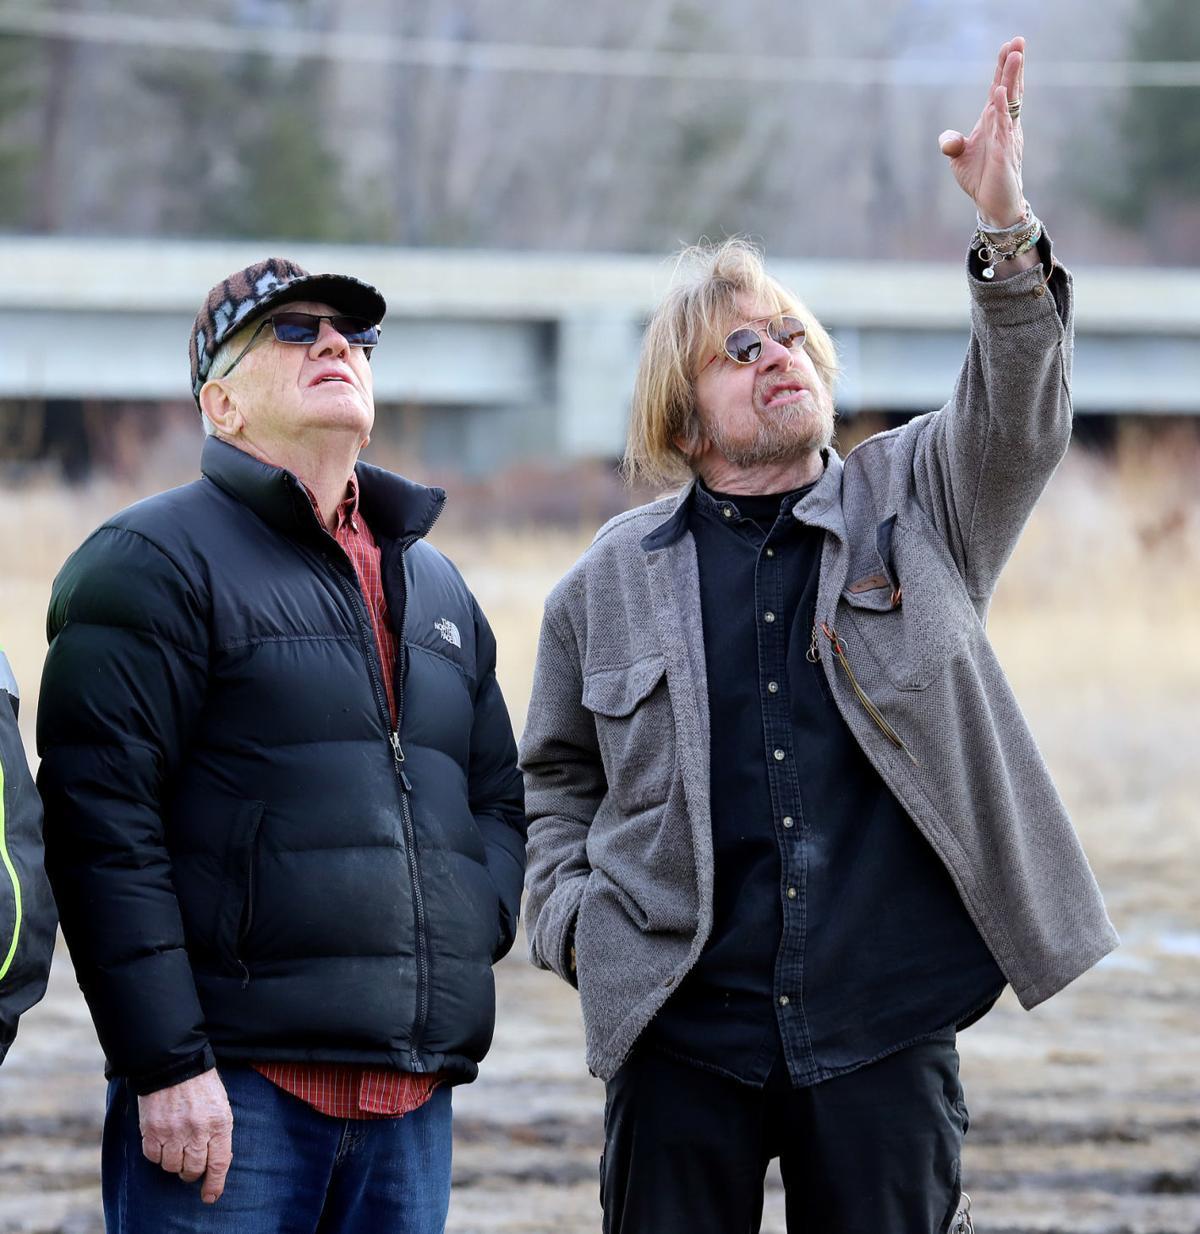 Art for art's sake: New kinetic sculpture appears north of Hamilton